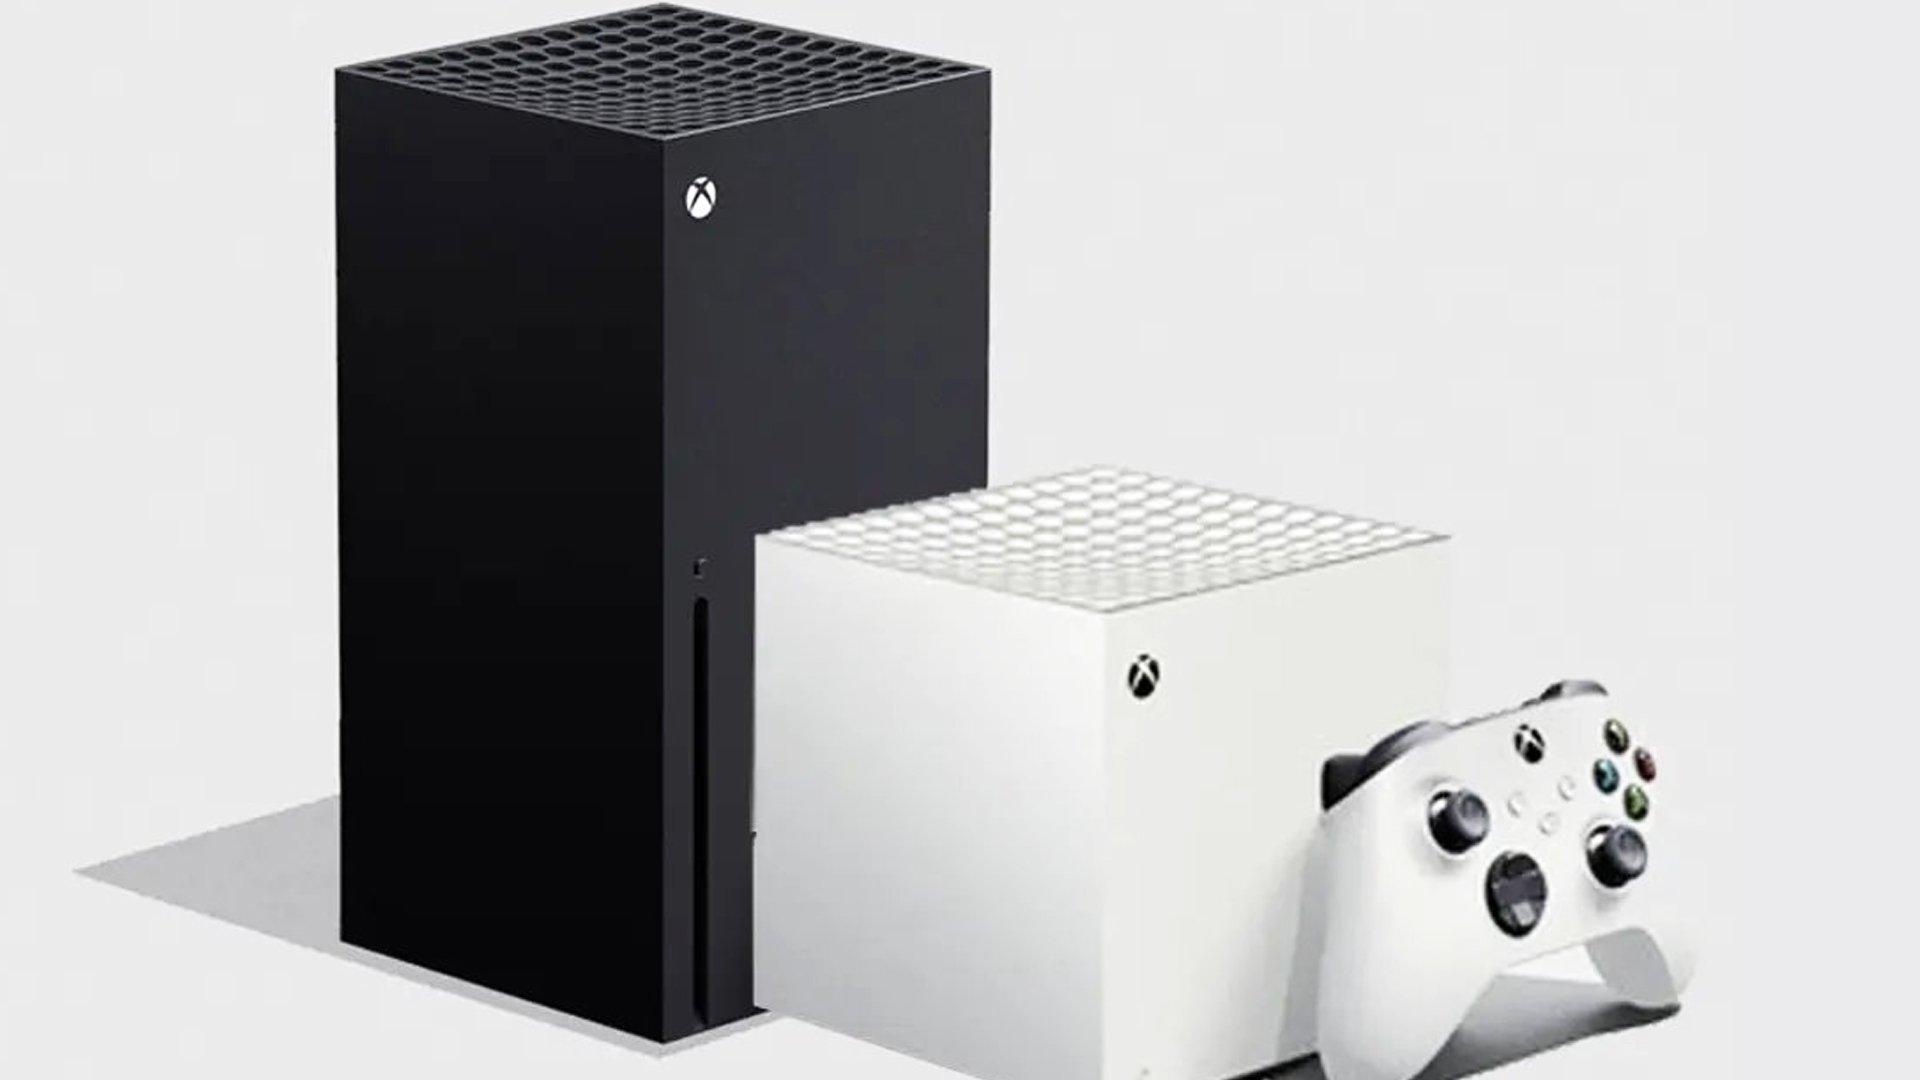 box Series X e Xbox Series S